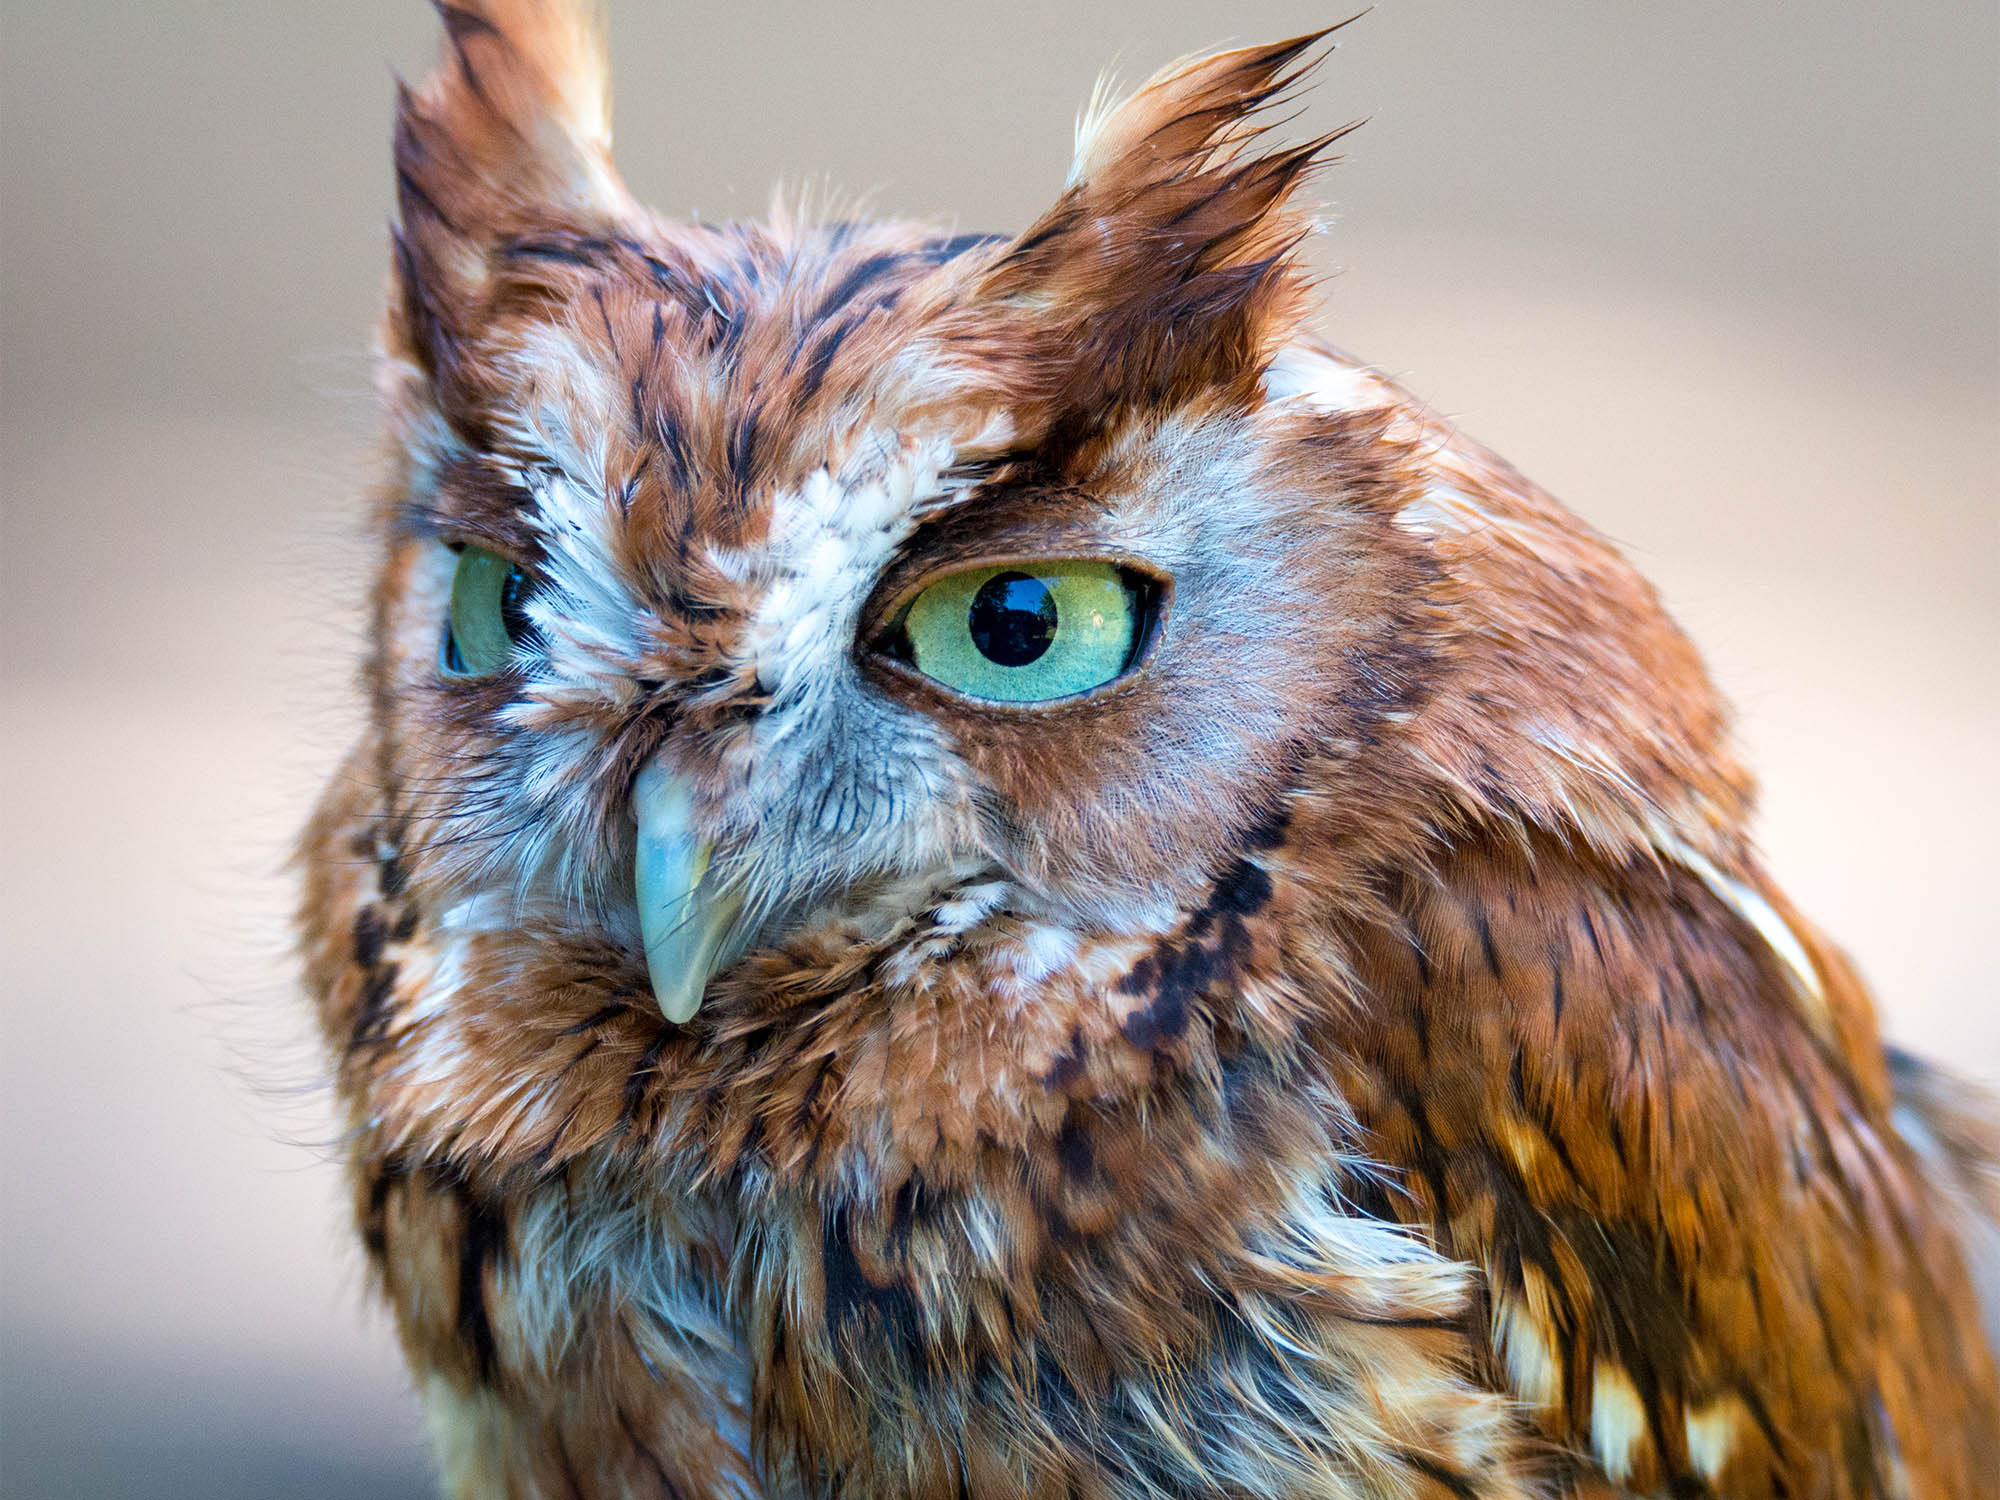 Owl Worksheets For 4th Grade